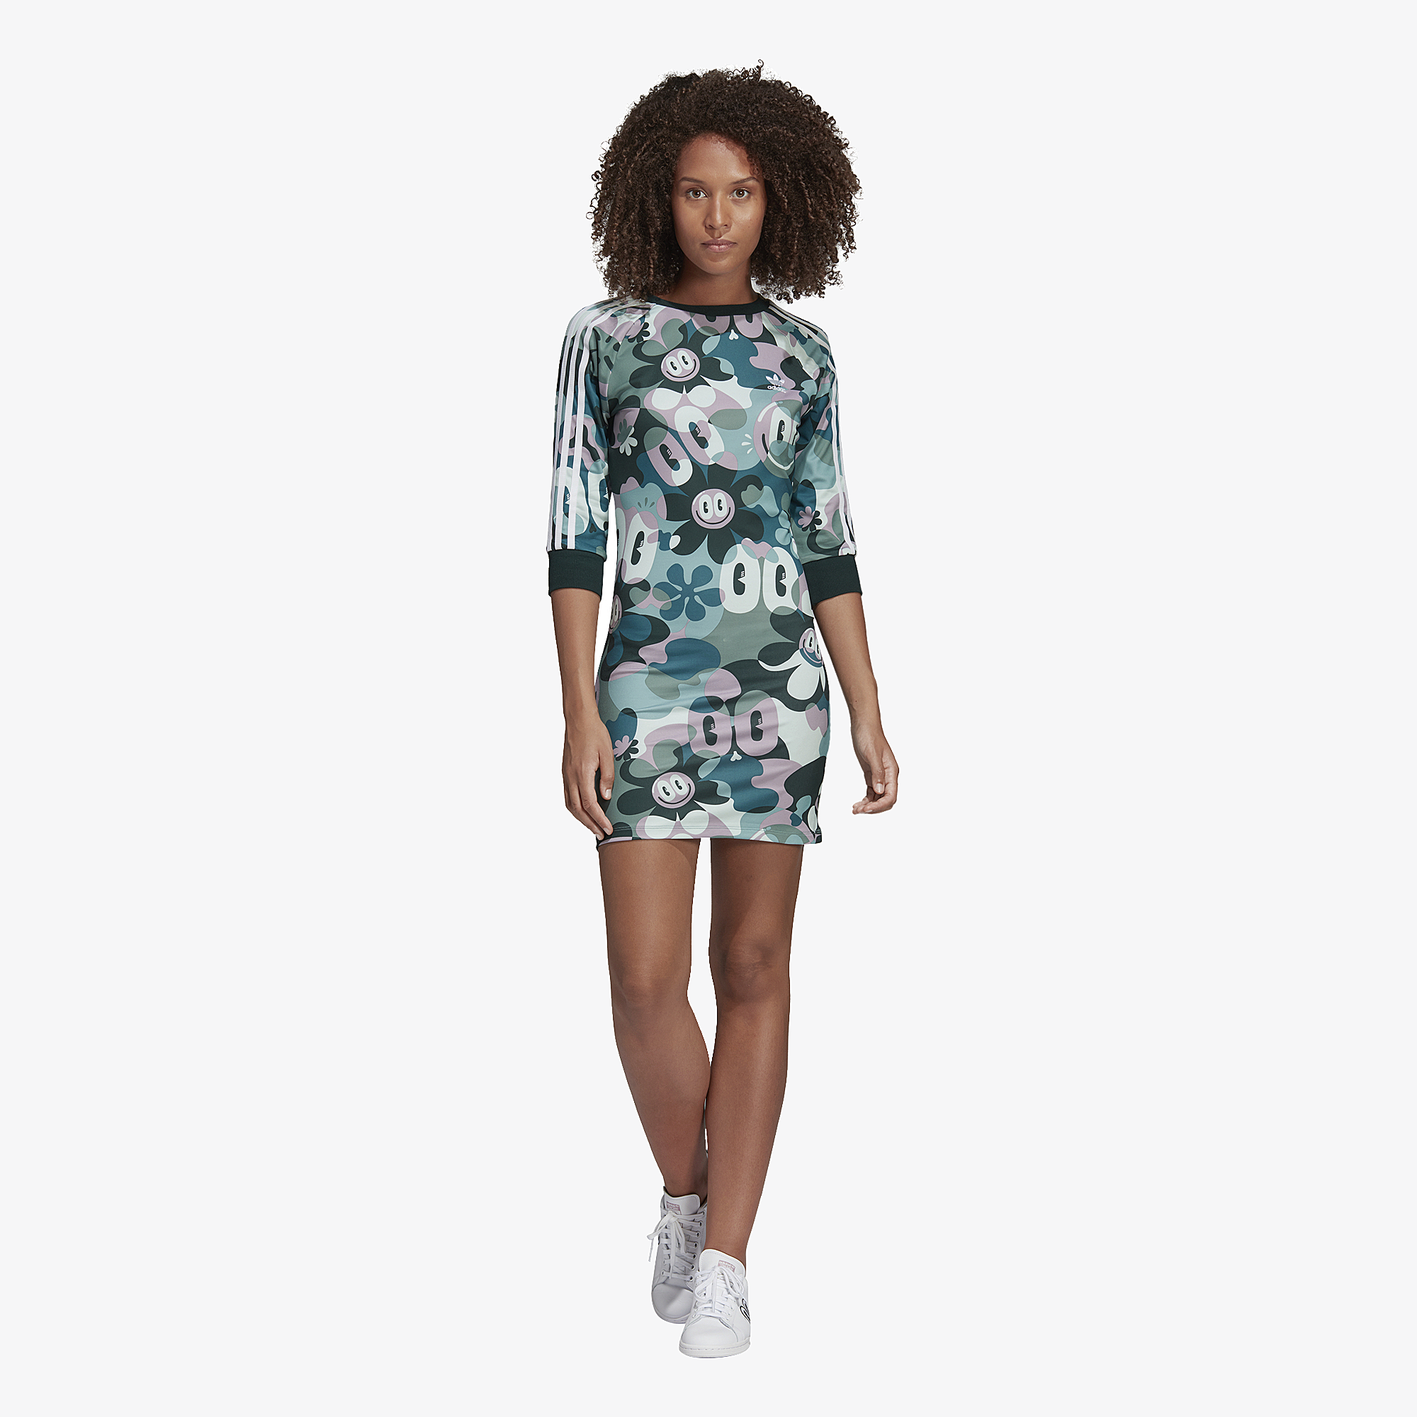 adidas Originals Gallery 3-Stripe Dress - Women s - Casual ... 1627aef8bd19